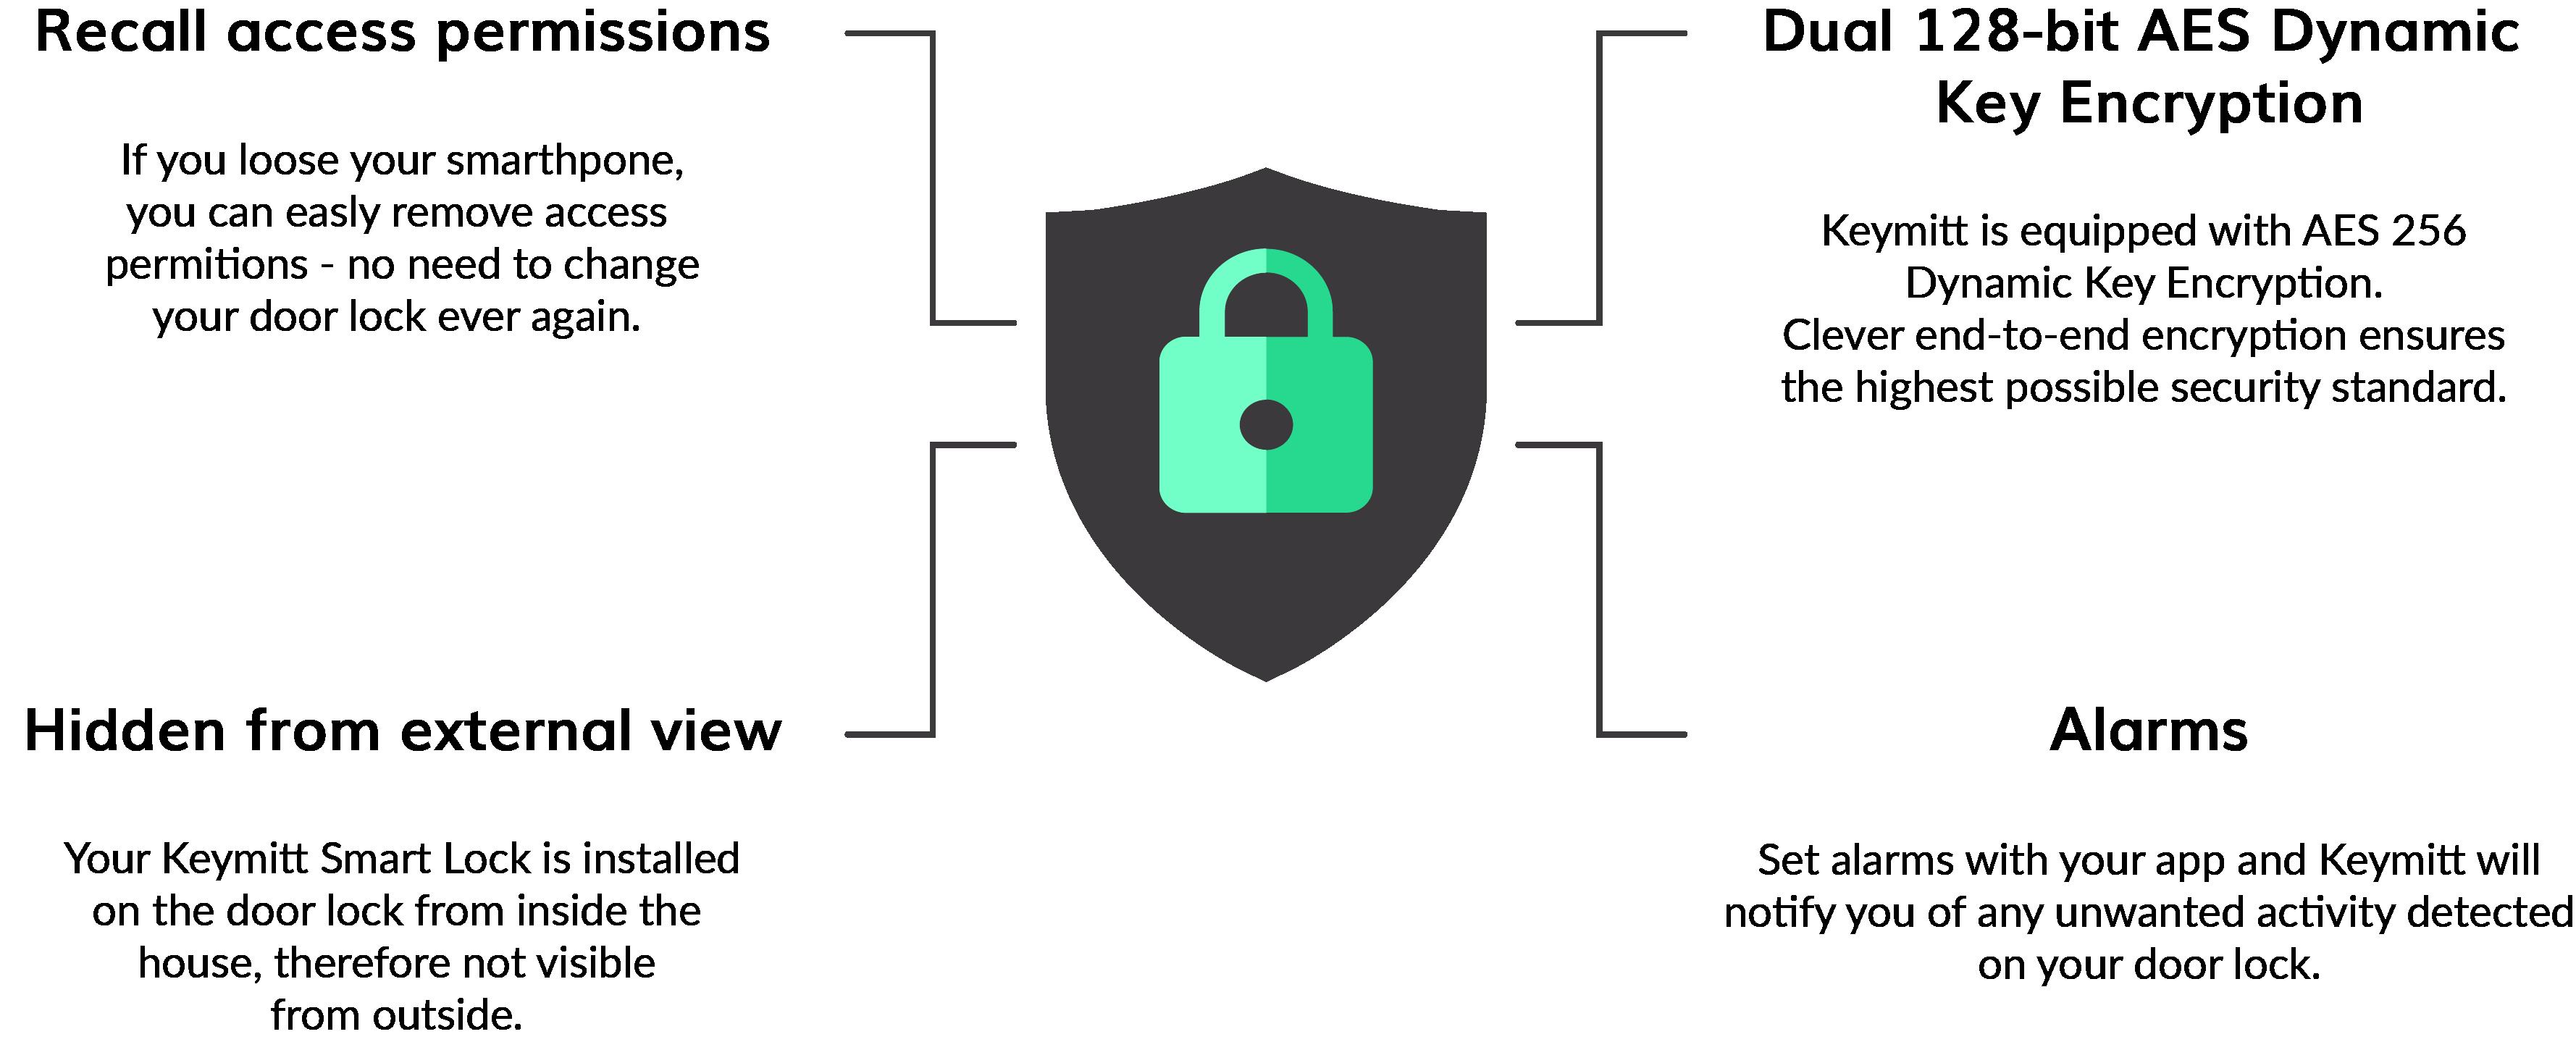 keymitt secuirtyty encryption alarms hidden from external view